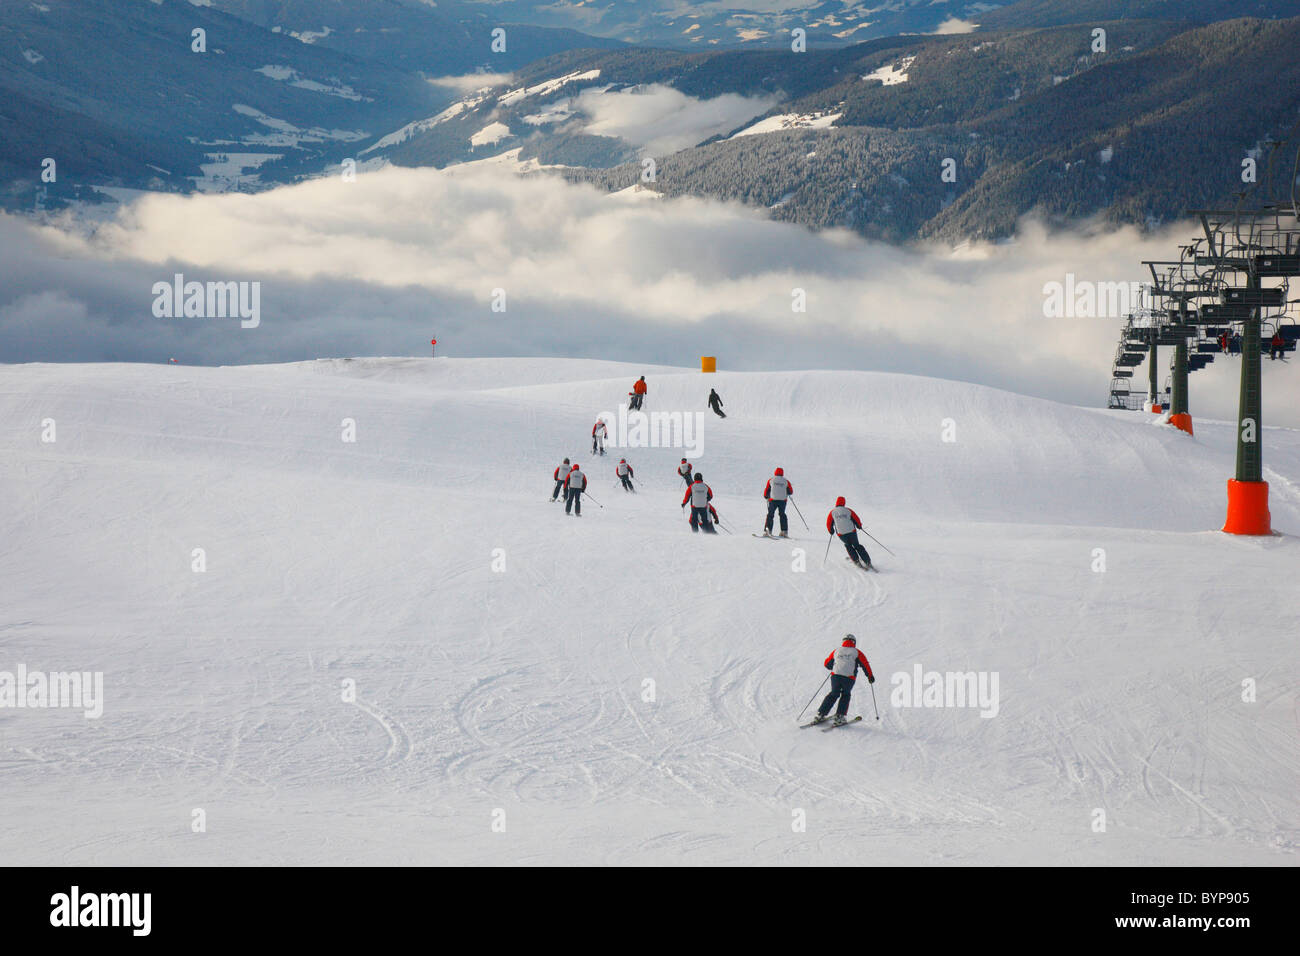 Skiing in Dolomite, Italy, Europe - Stock Image